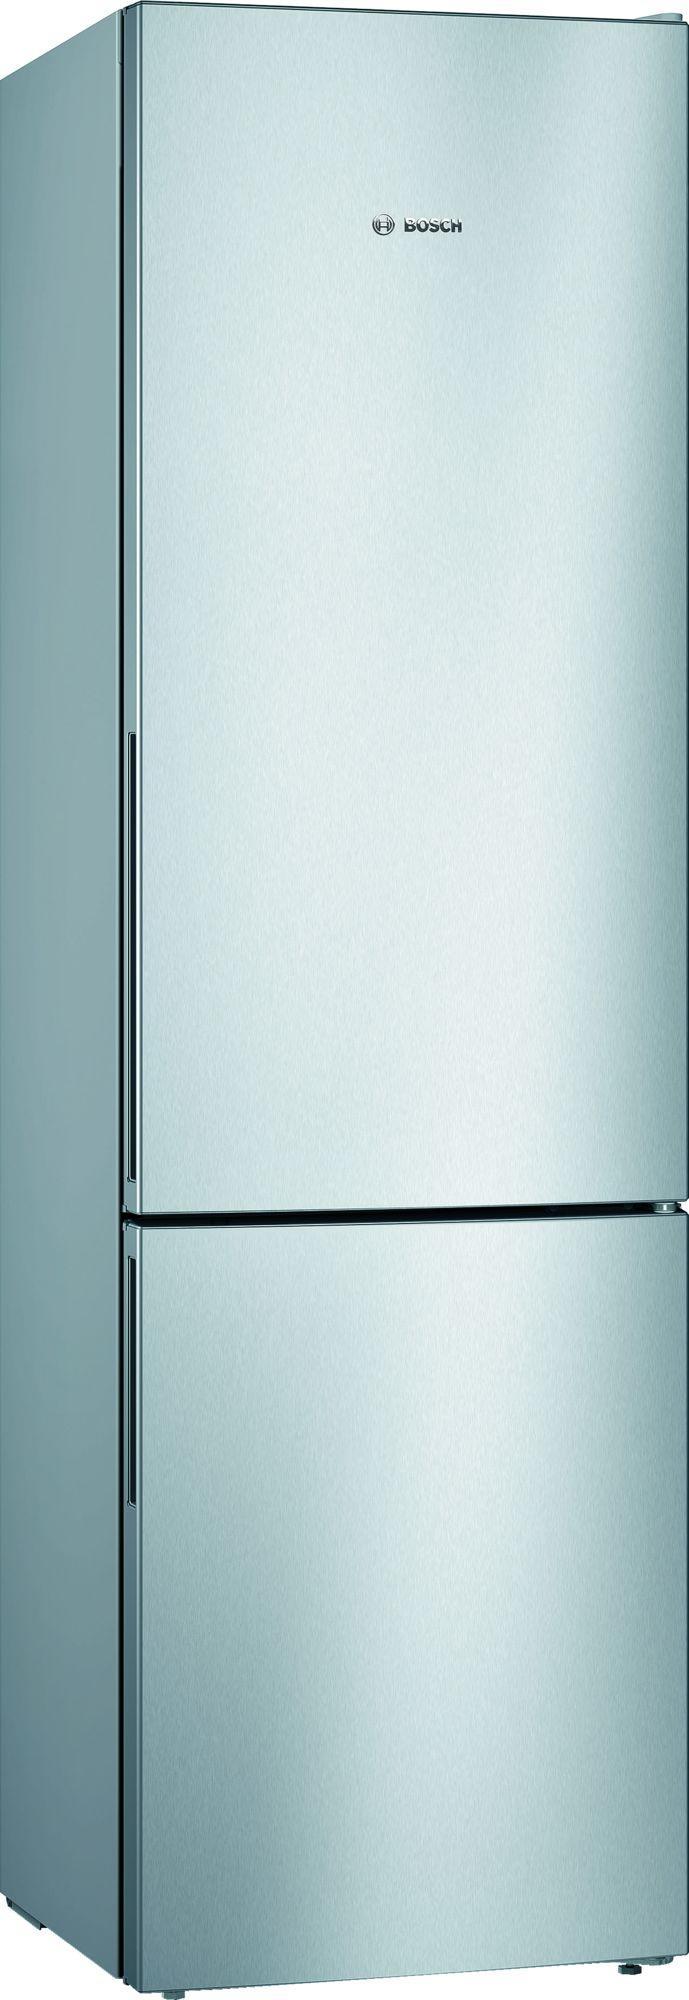 Image of Serie 4 KGV39VLEAG 342 Litre Fridge Freezer | Silver Innox